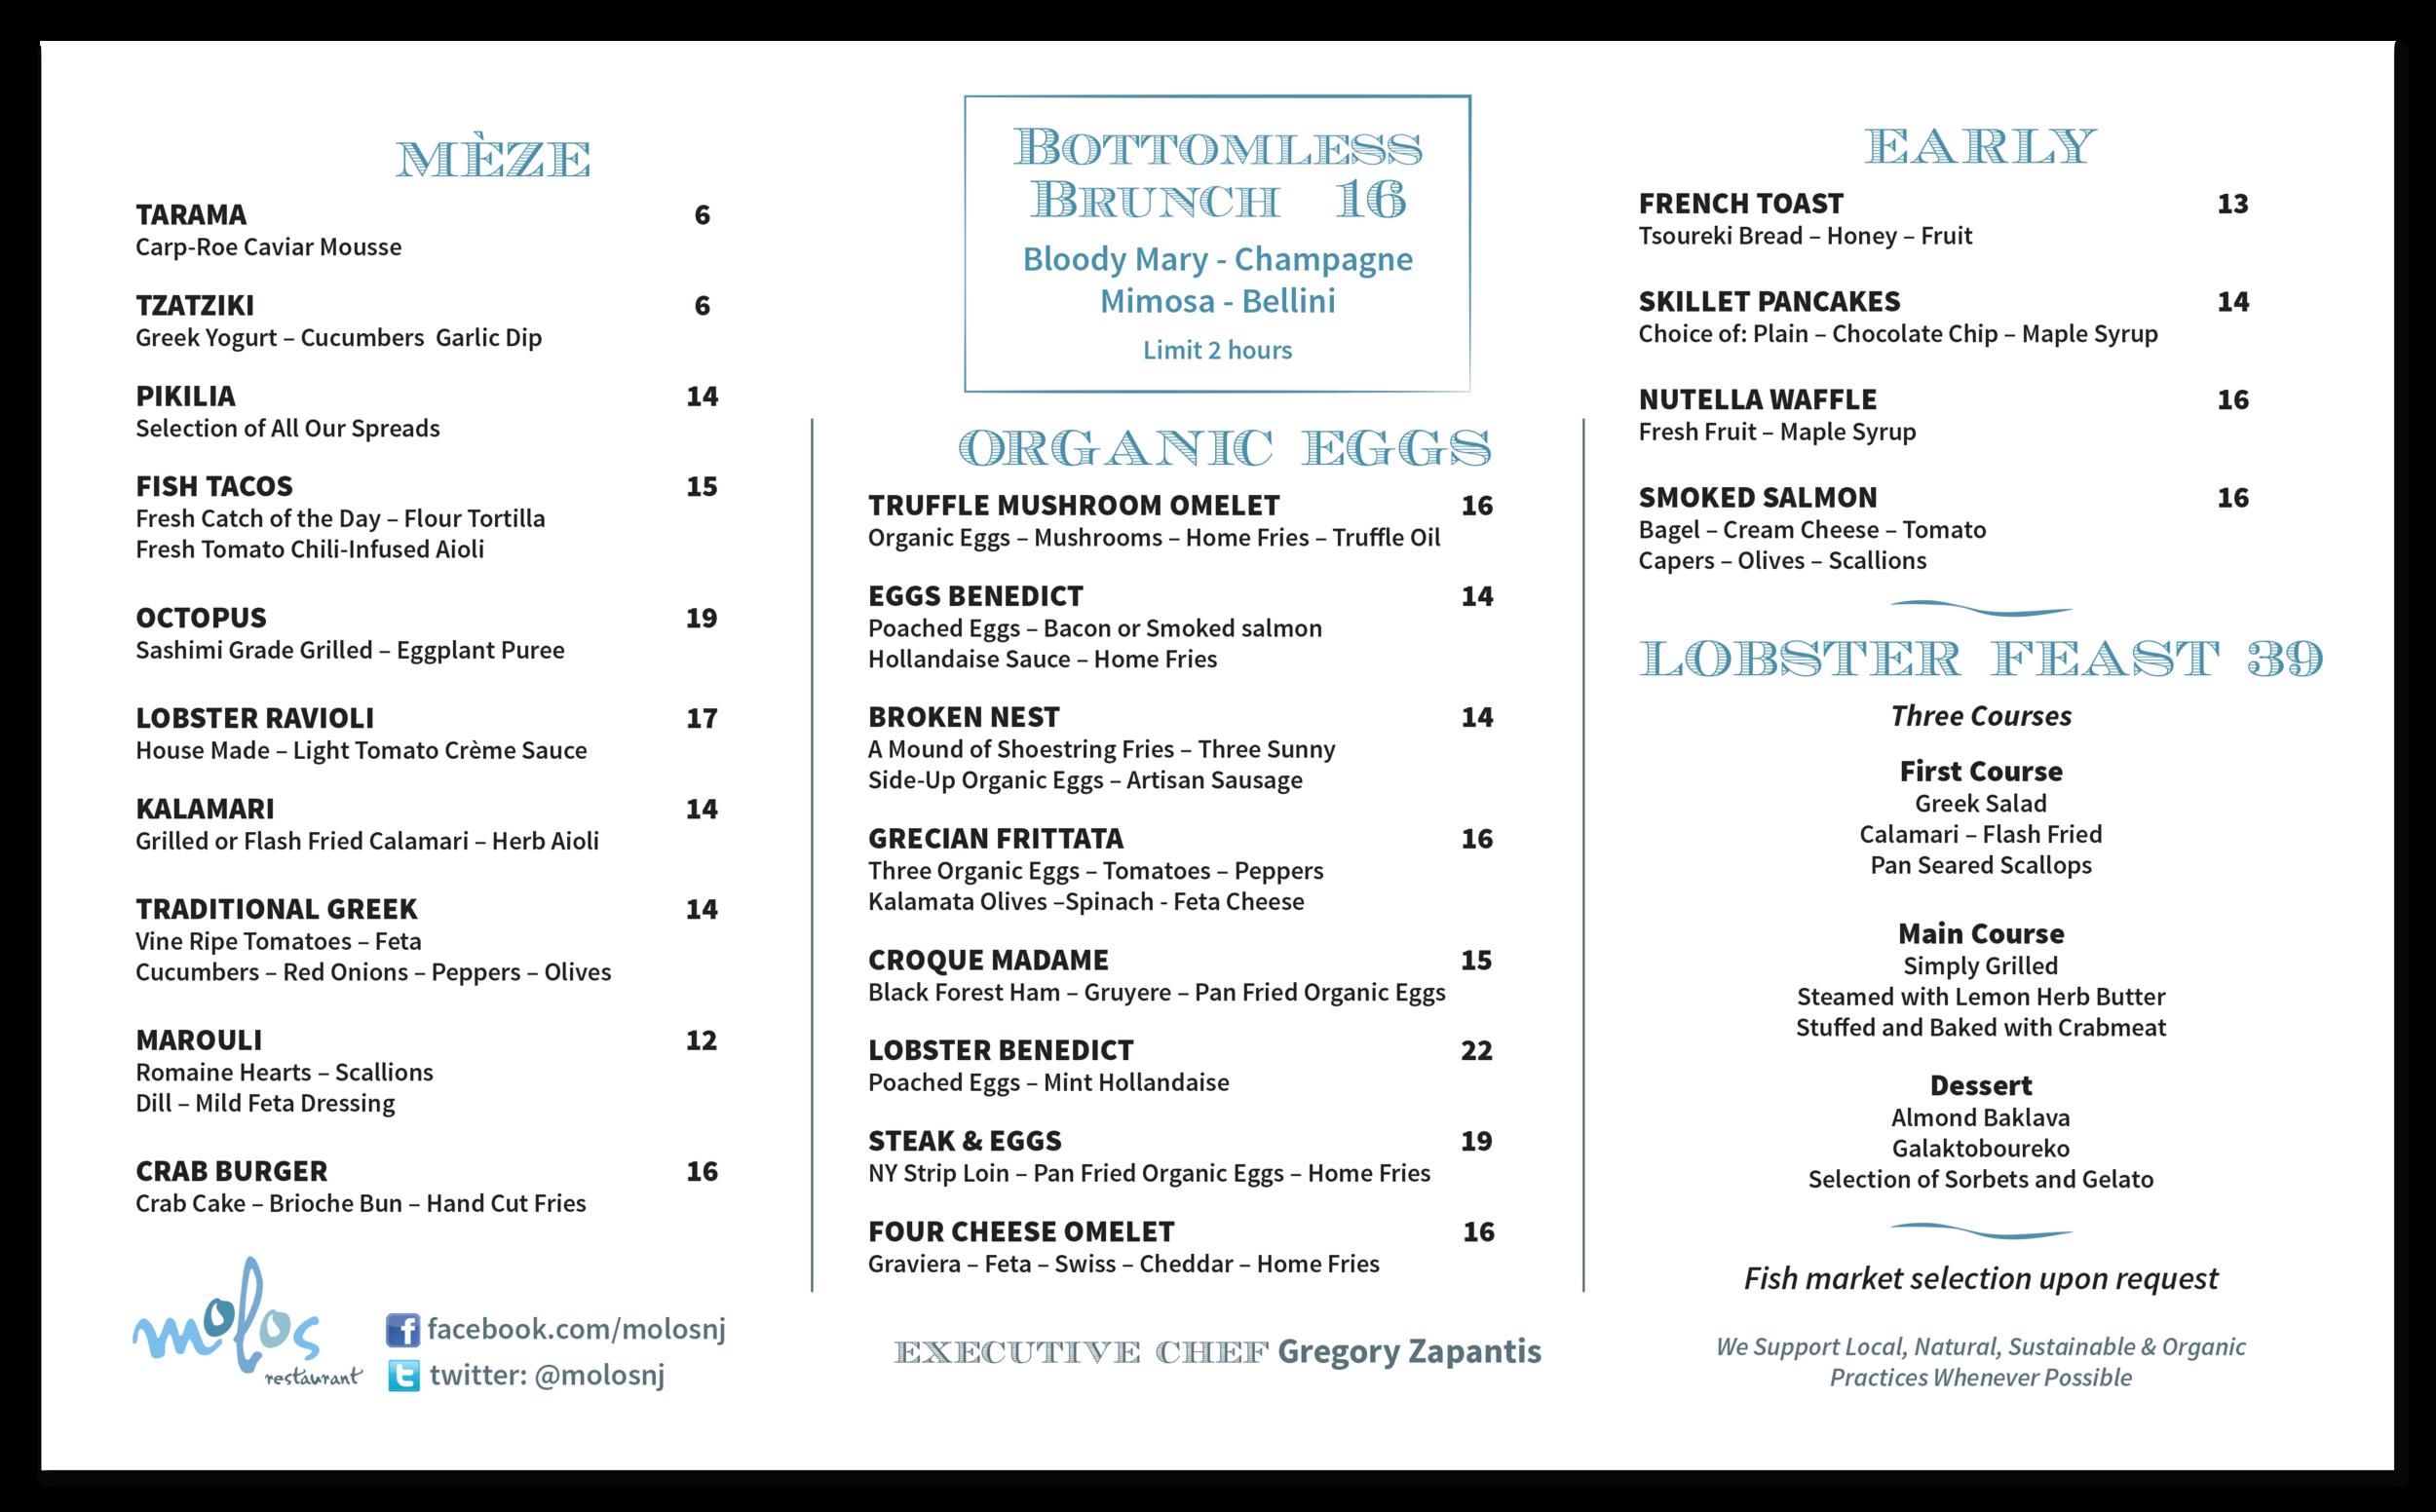 Brunch menu.